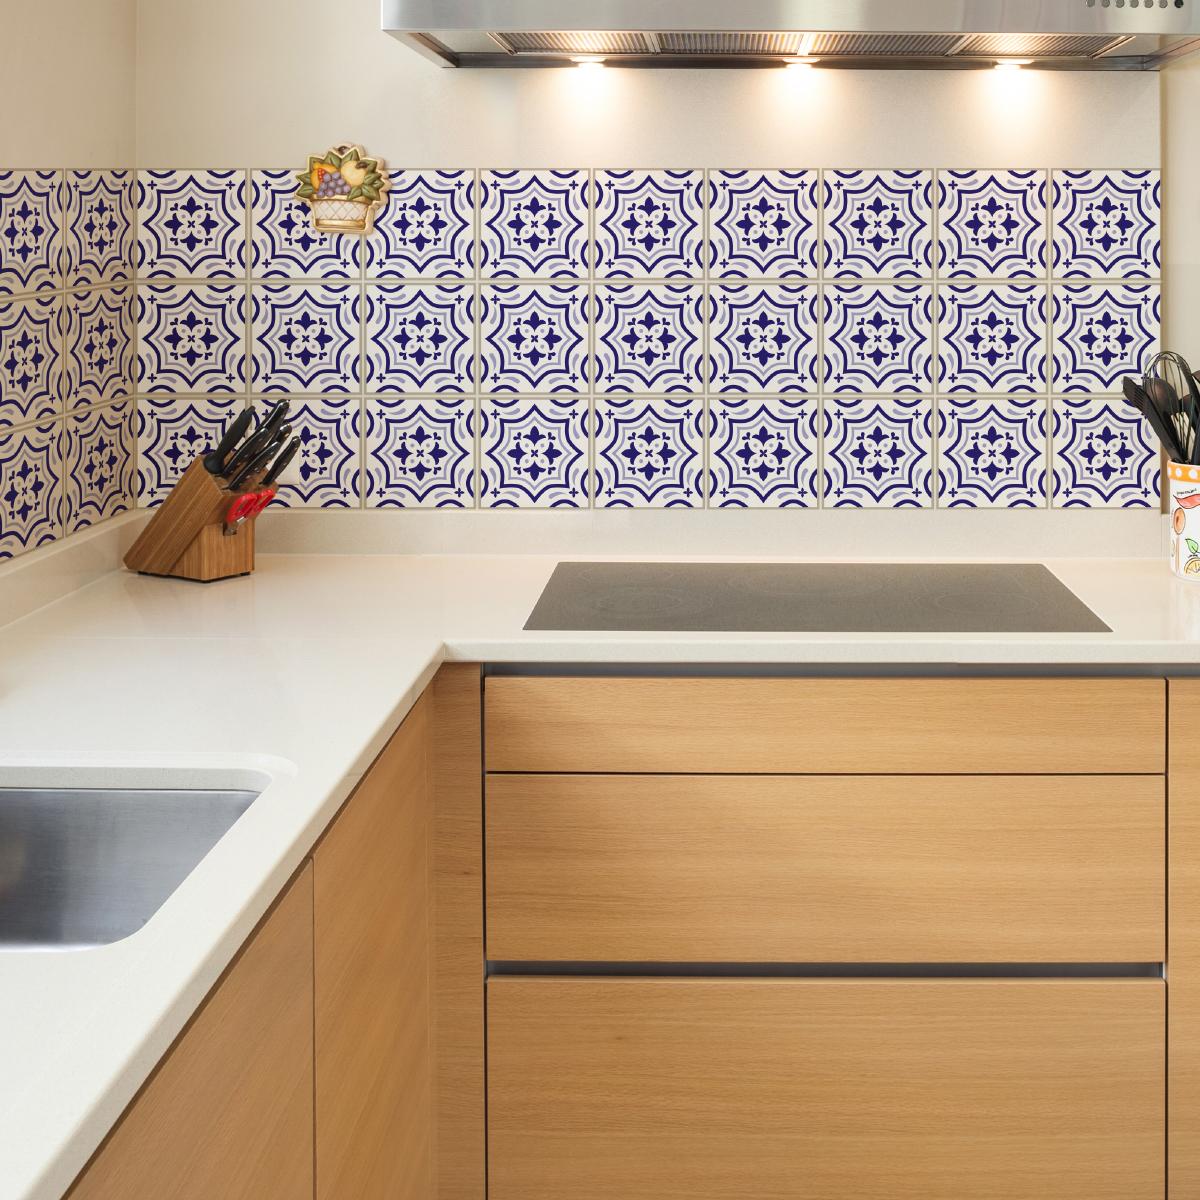 9 stickers carrelages azulejos beata salle de bain et wc salle de bain ambiance sticker. Black Bedroom Furniture Sets. Home Design Ideas